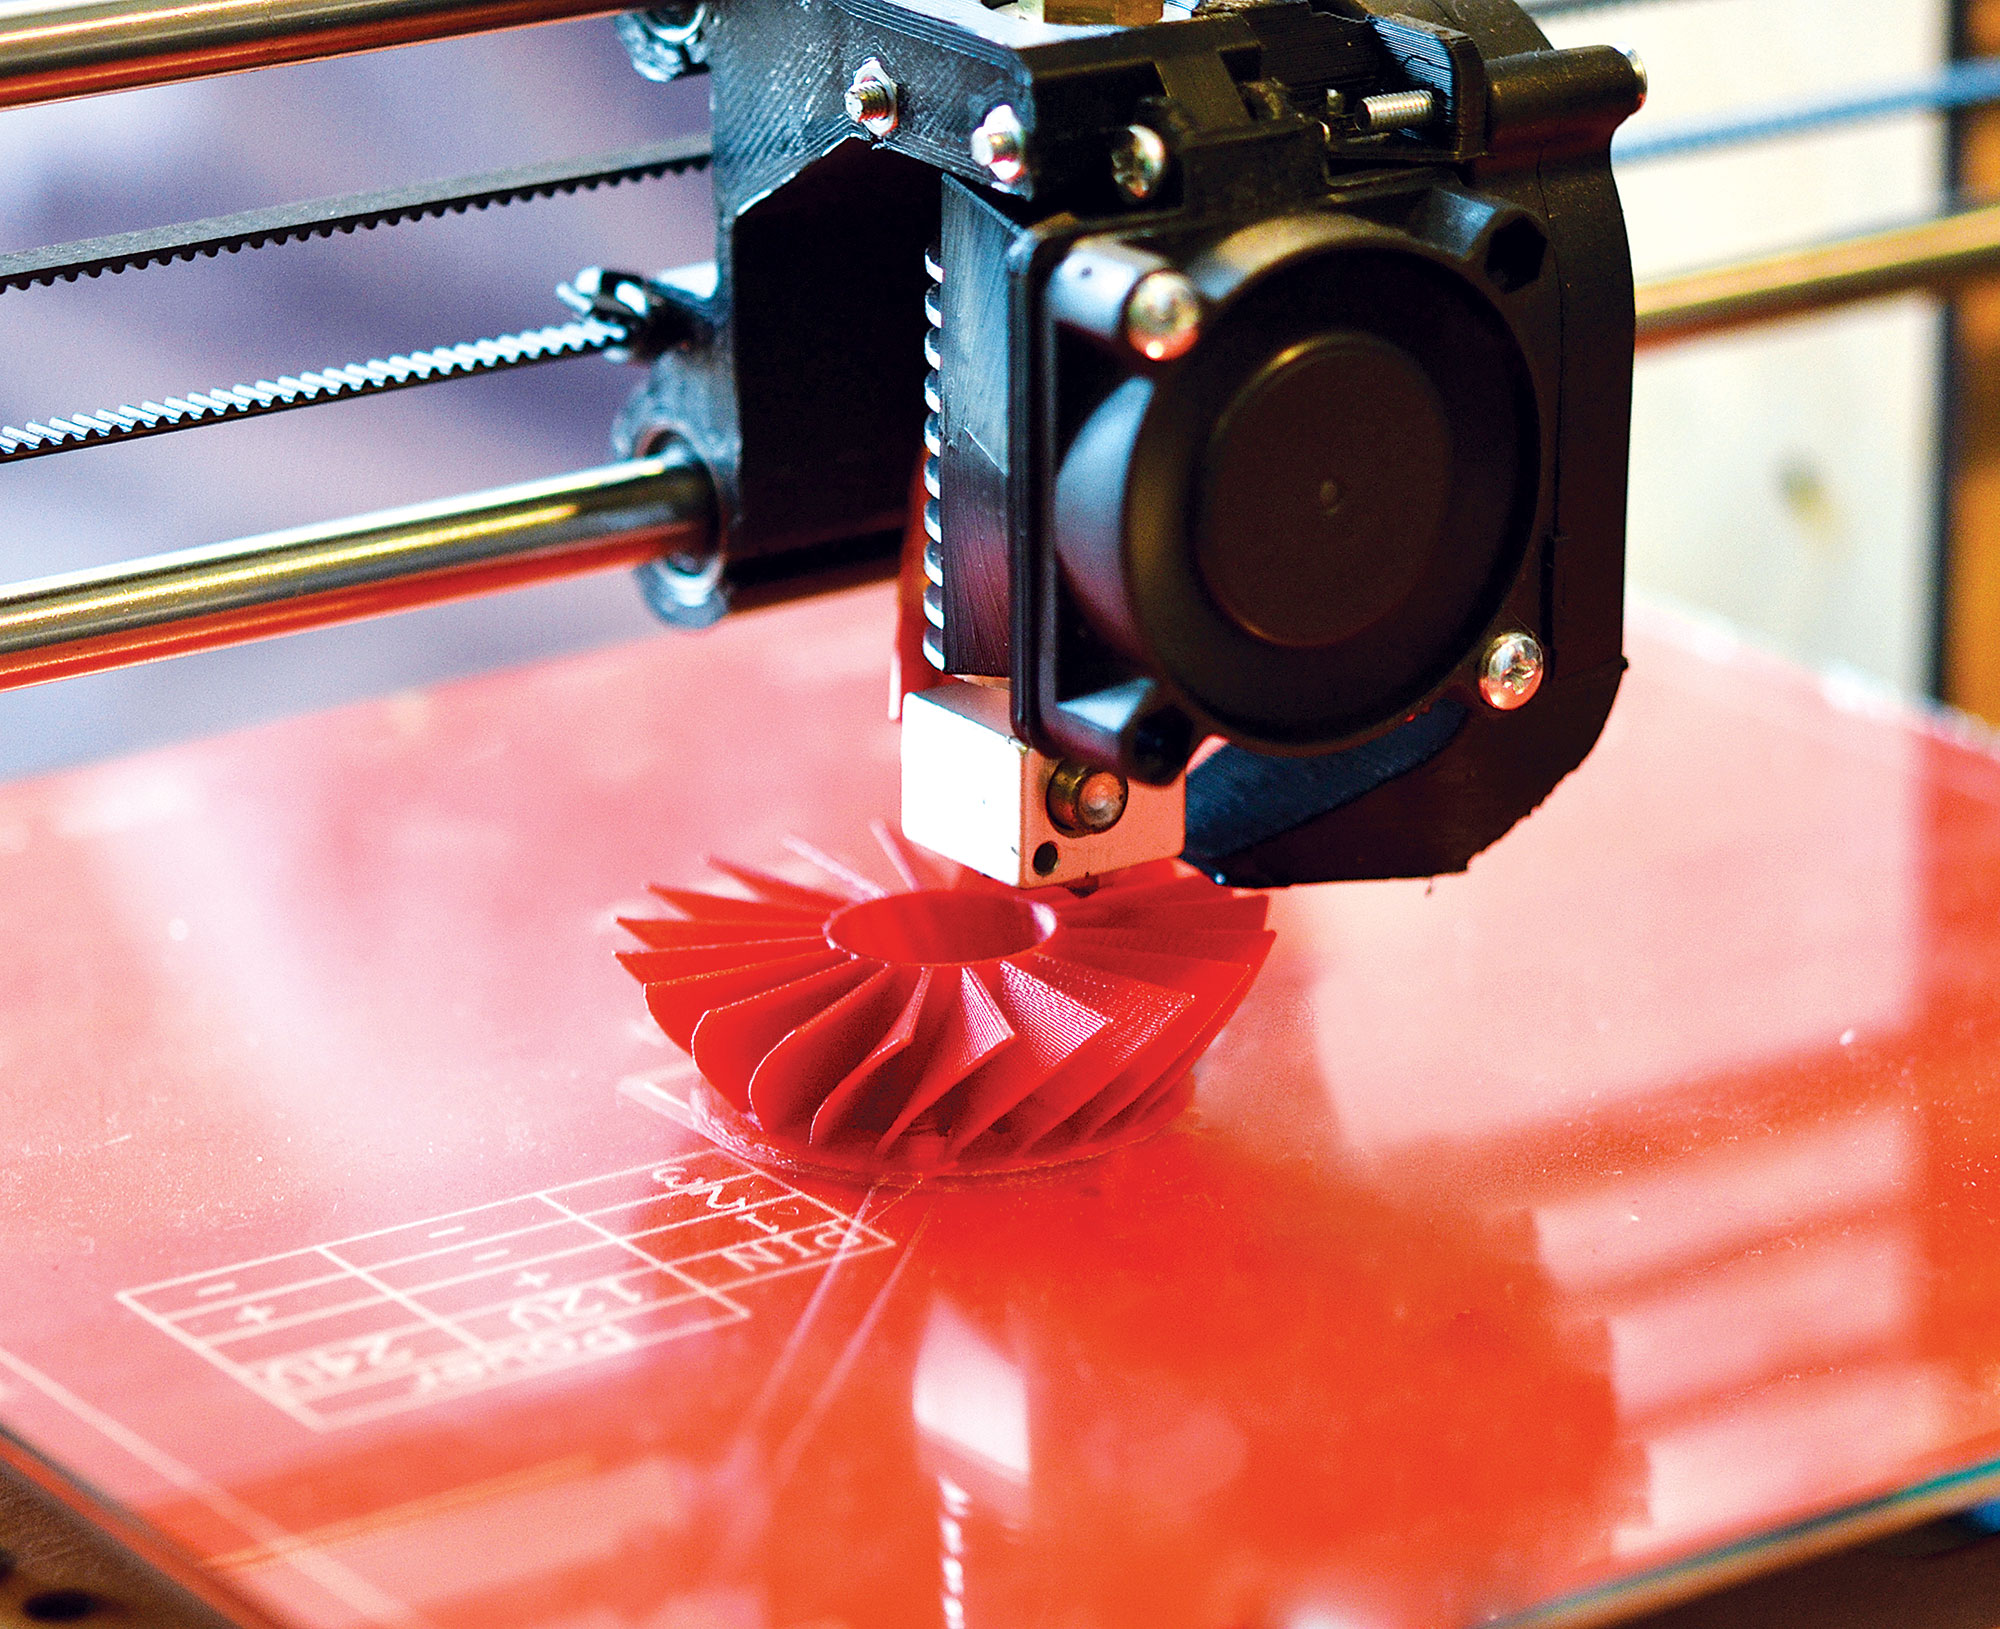 3-D printer emissions raise concerns and prompt controls